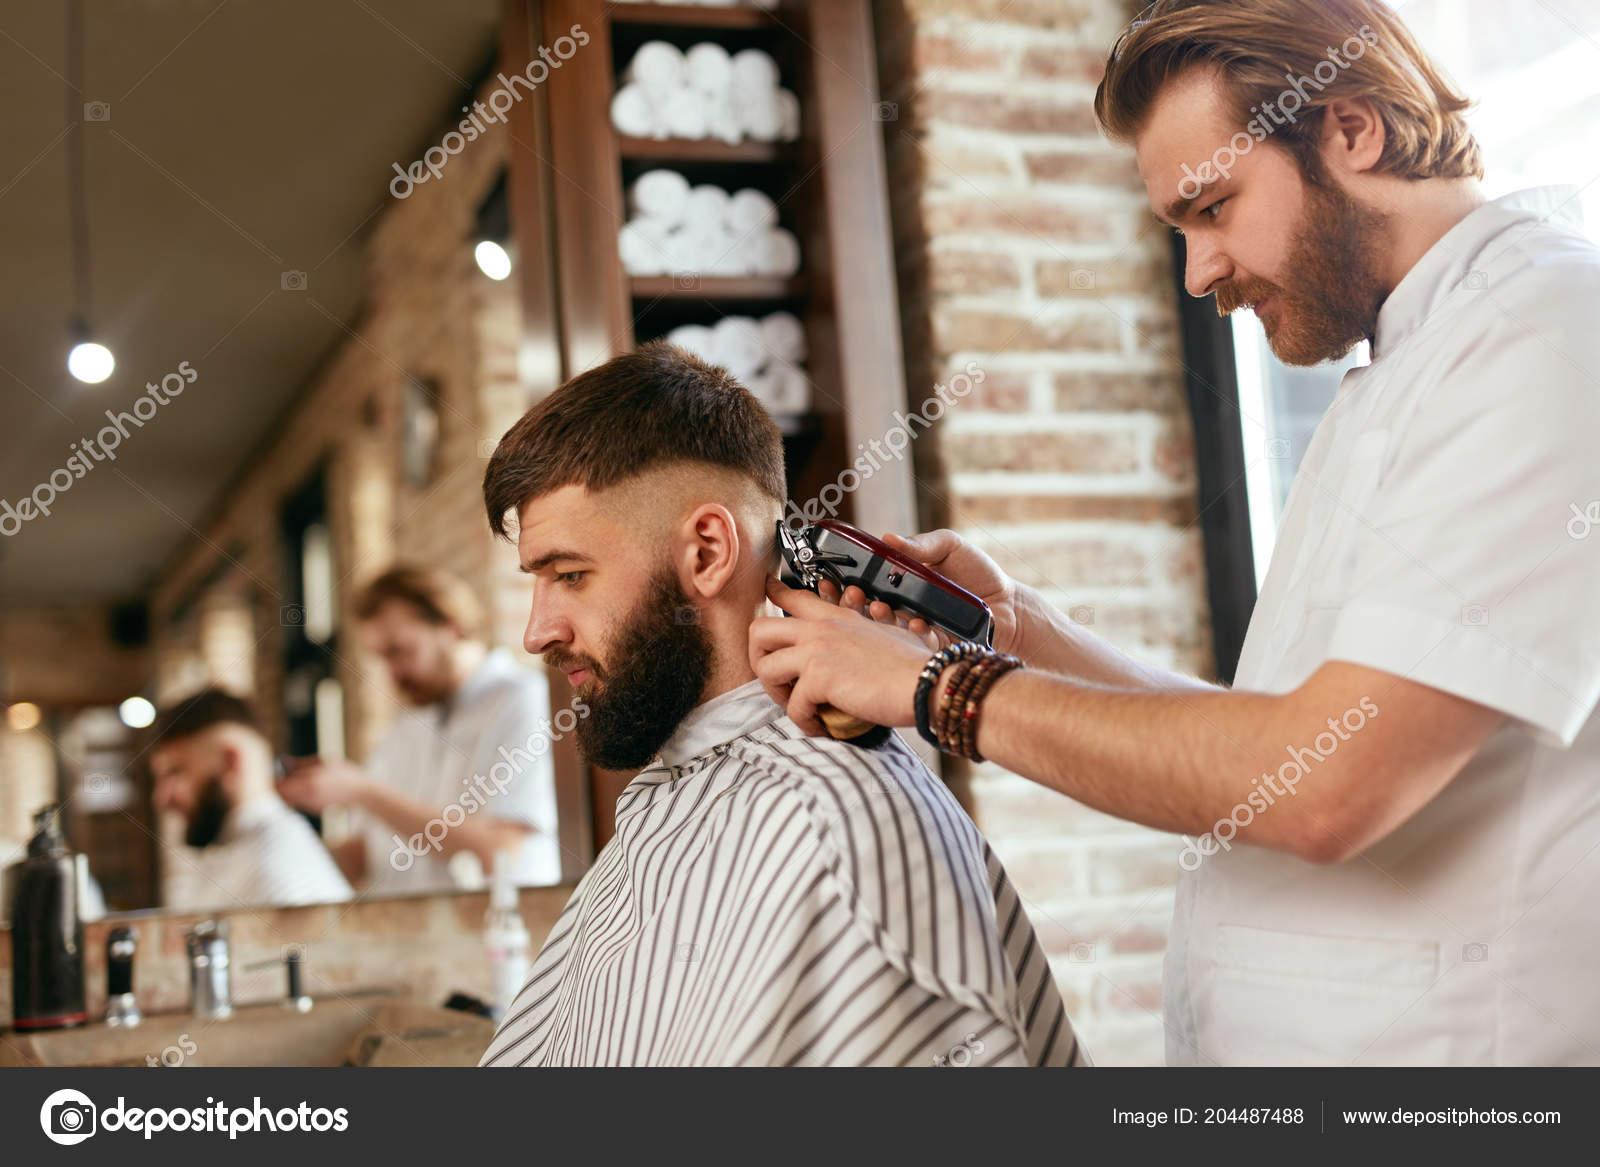 Barber Shop Men Hair Cut Barber Doing Men Fashion Hairstyle Stock